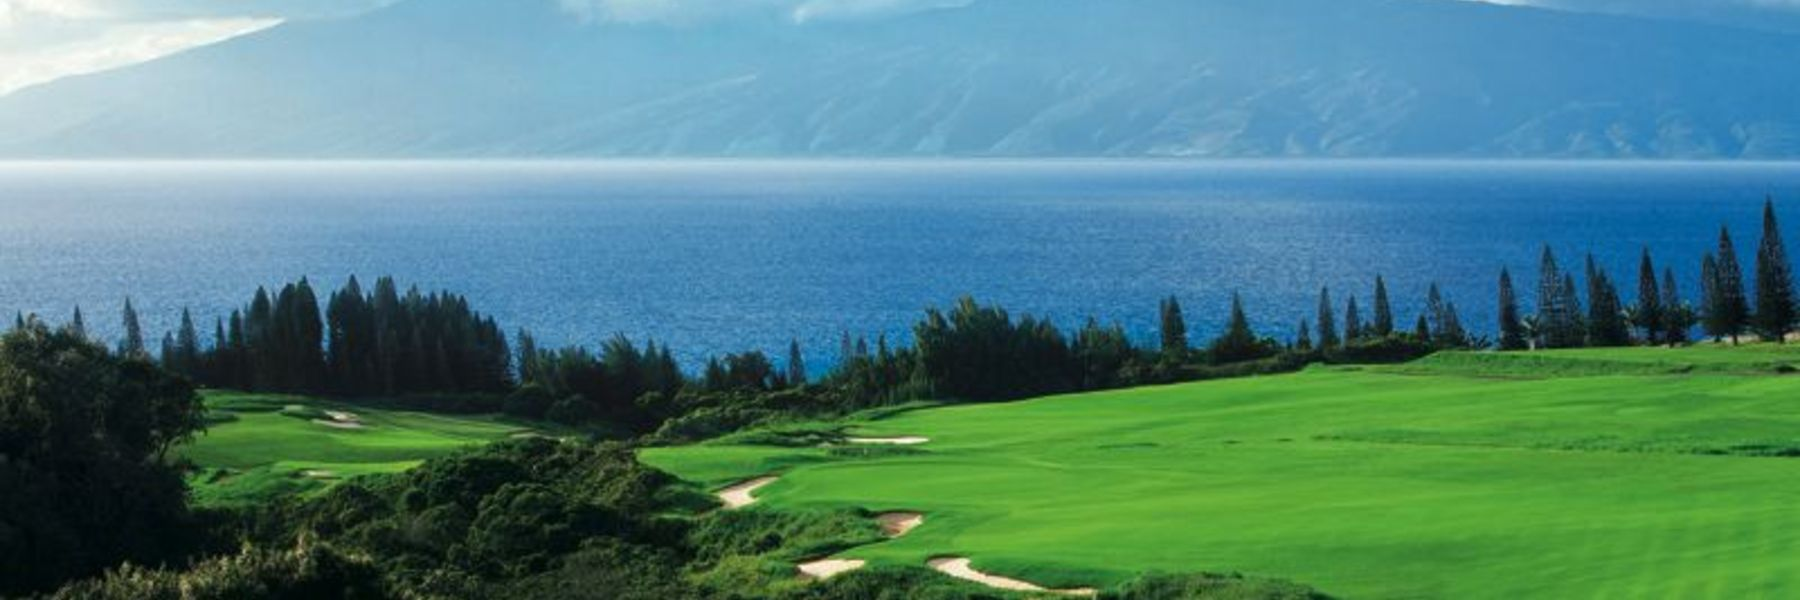 Golf Vacation Package - Kapalua - Plantation